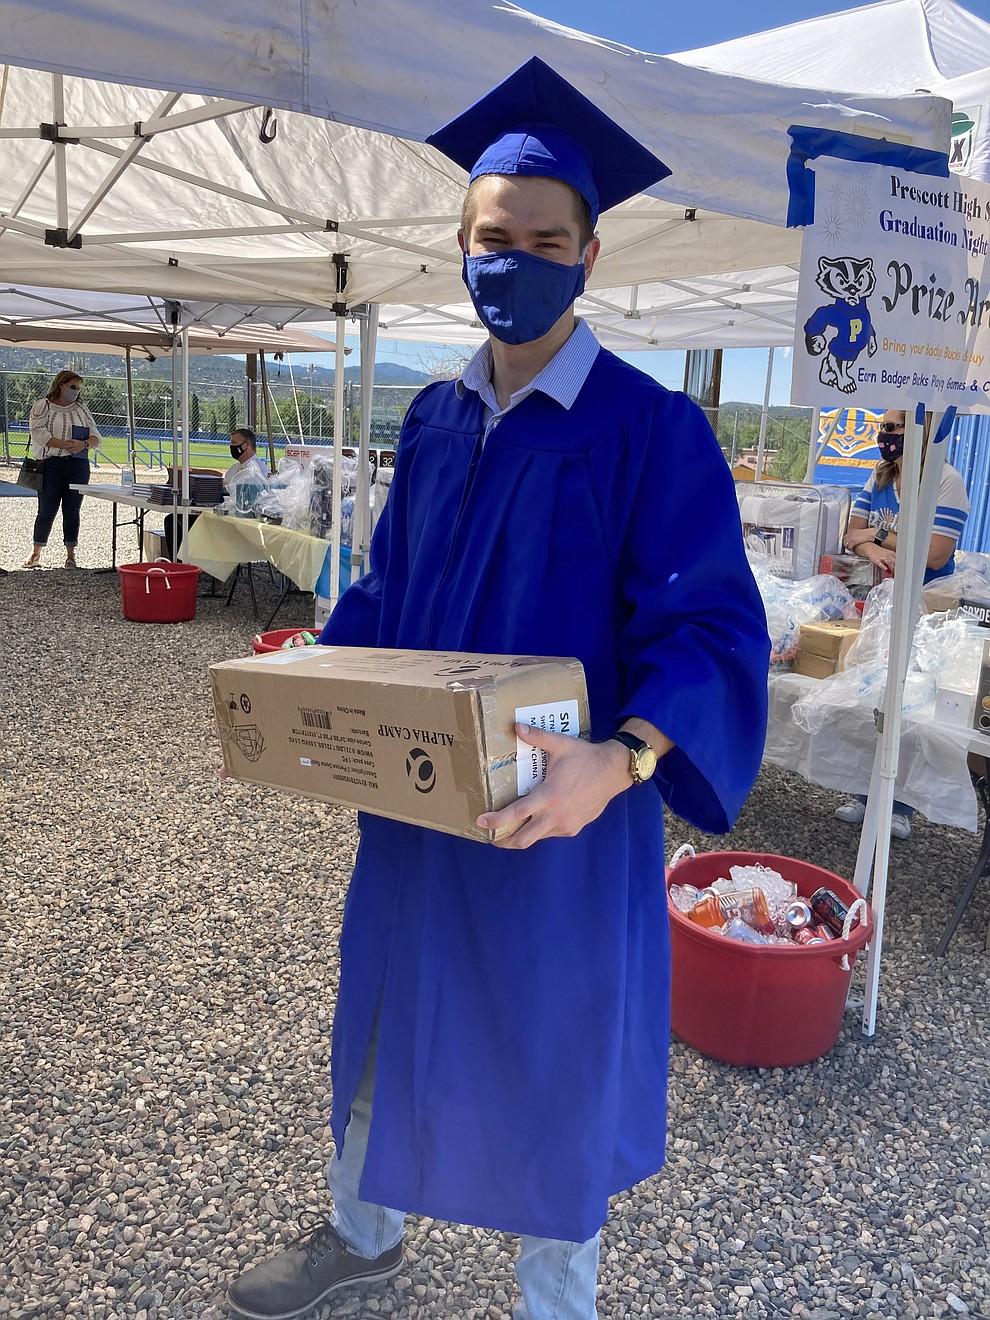 Prescott High School graduate Lucas Forray picks up a Grad  Night gift at the school's graduation Saturday, Aug. 8, 2020. (Nanci Hutson/Courier)